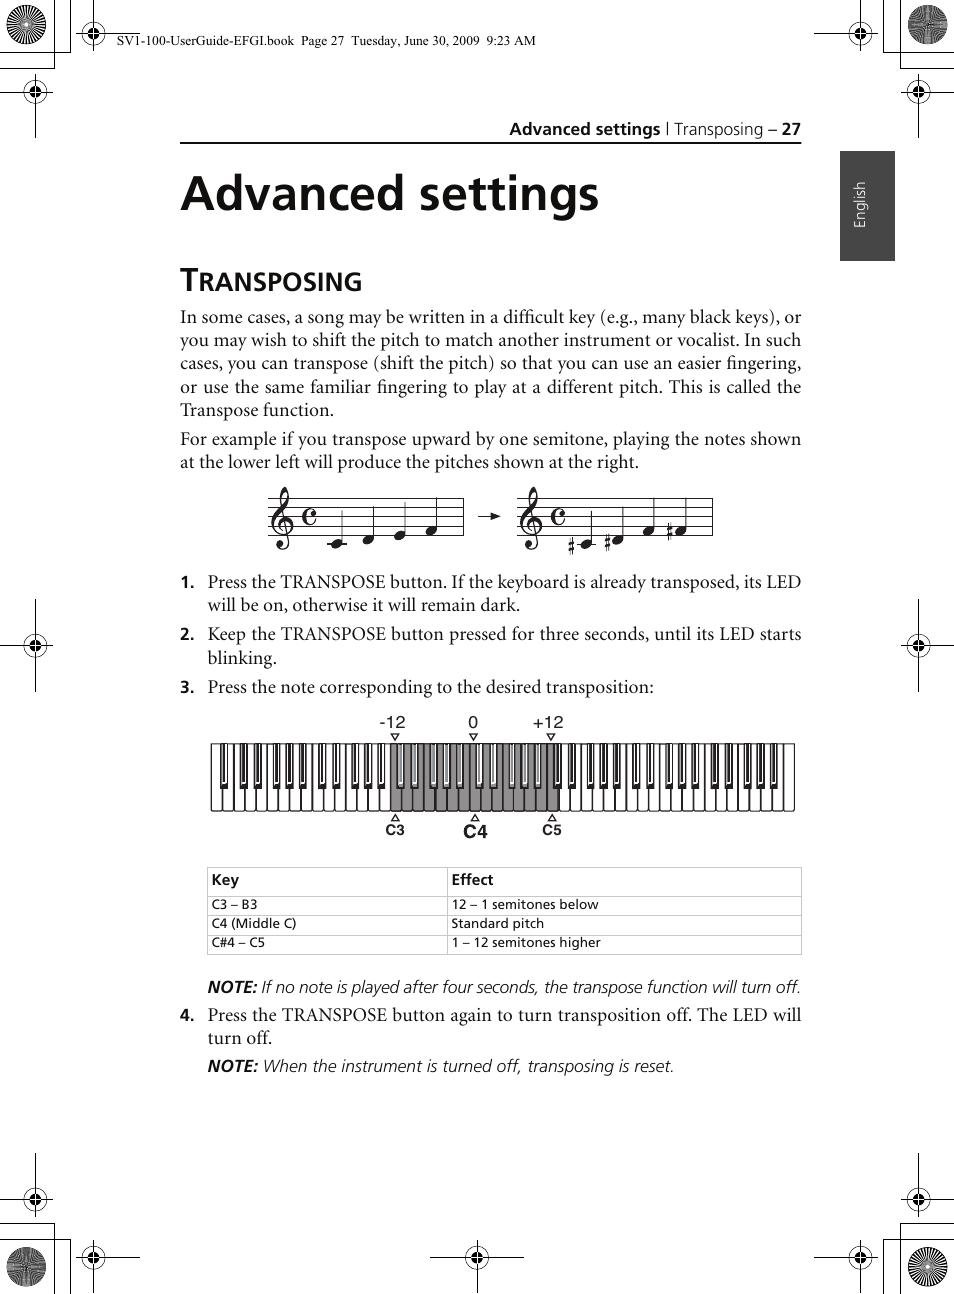 Advanced settings, Transposing, Ransposing | KORG STAGE